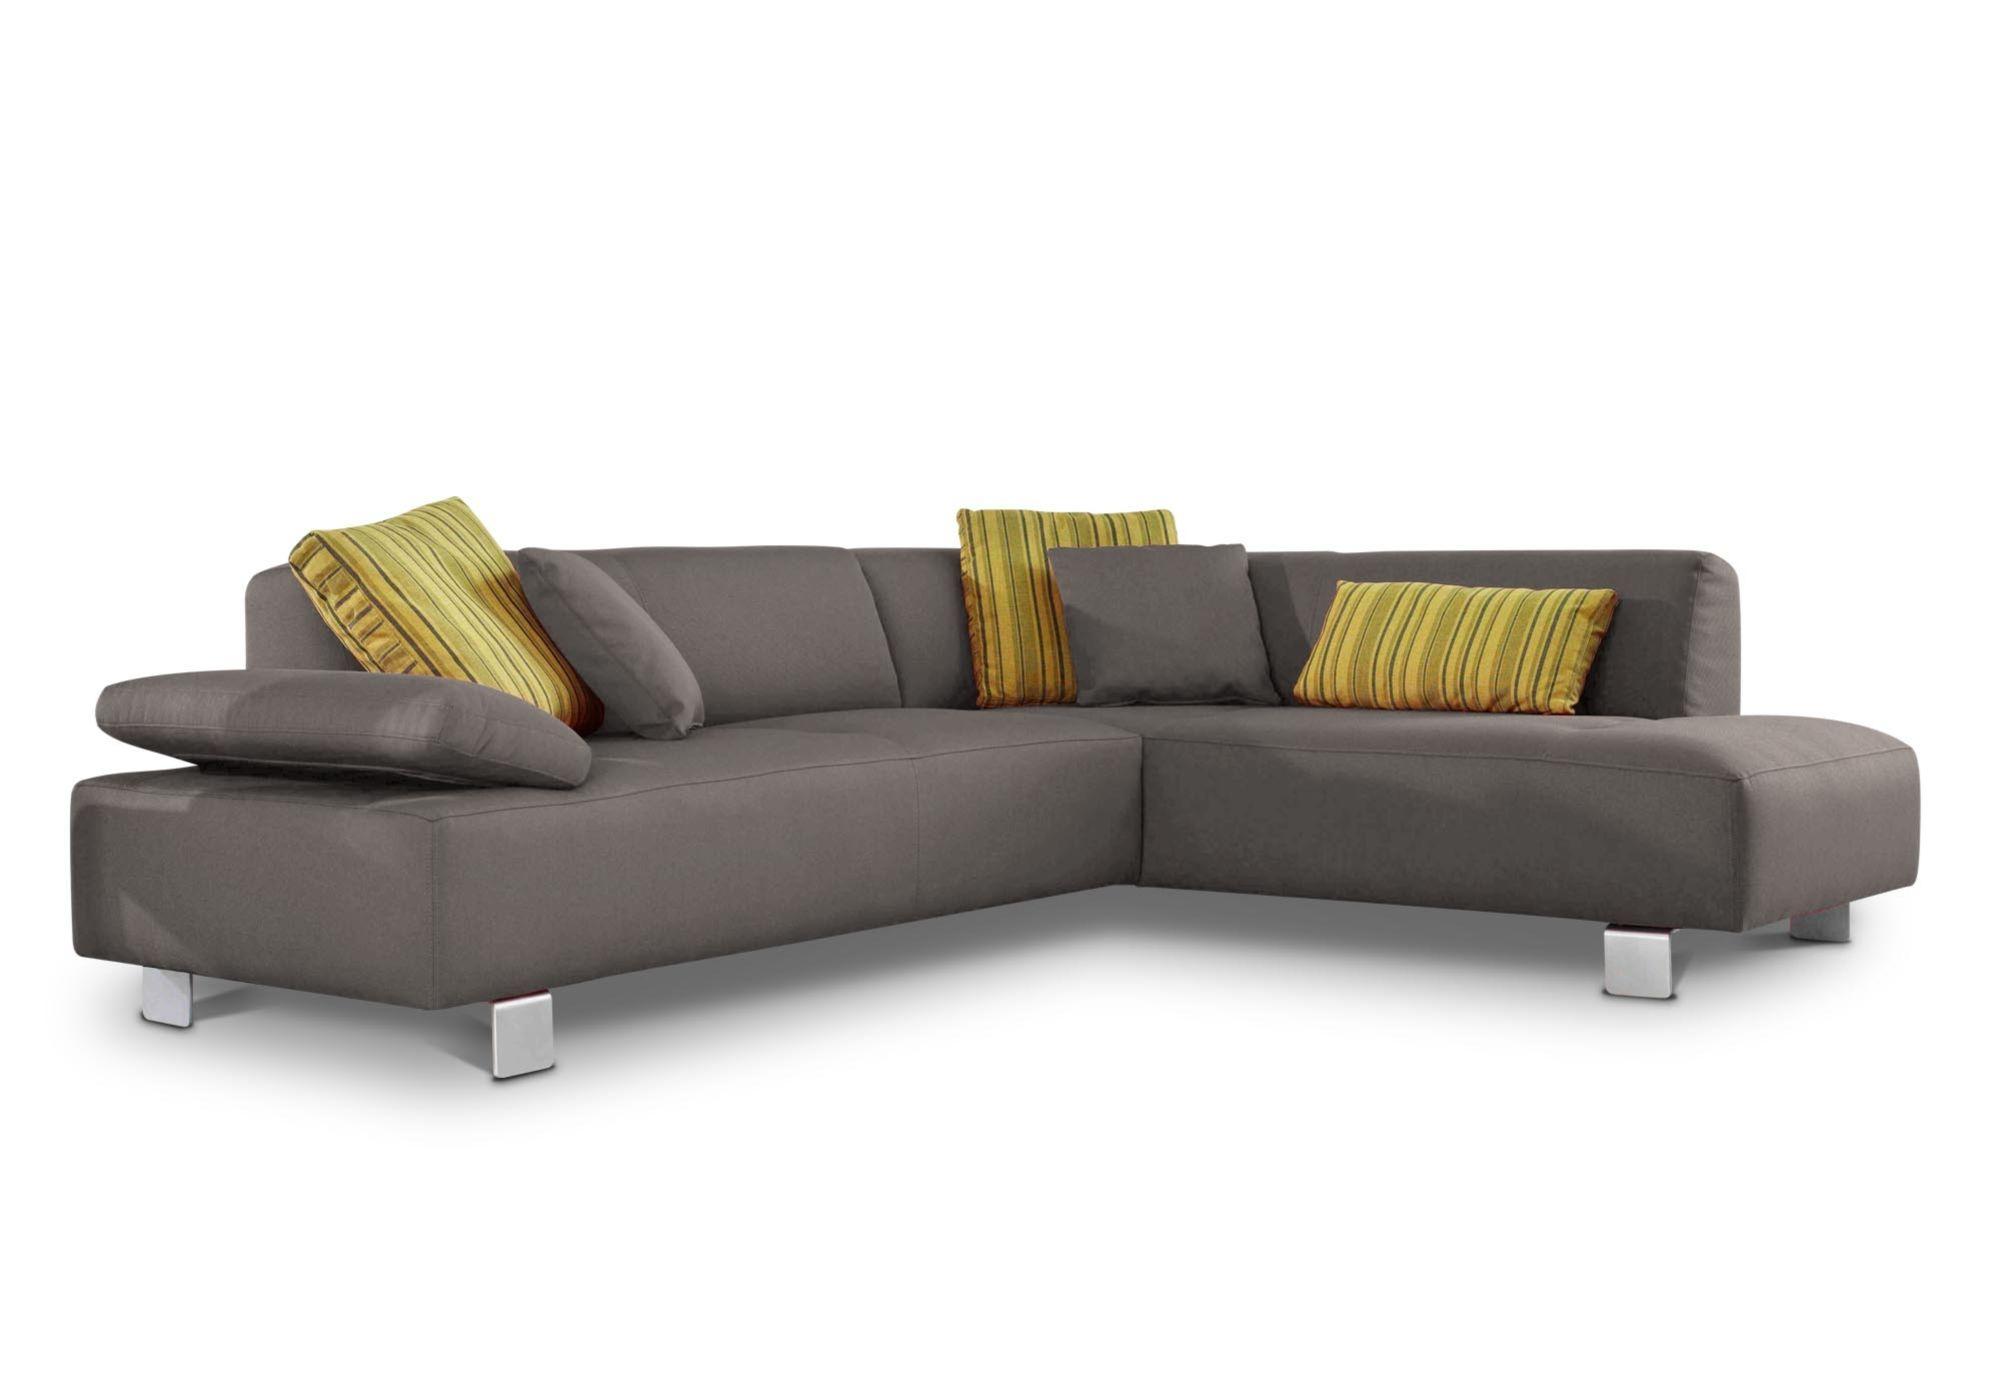 RHF corner chaise sofa Roxy Sofa Sets Corner Sofas